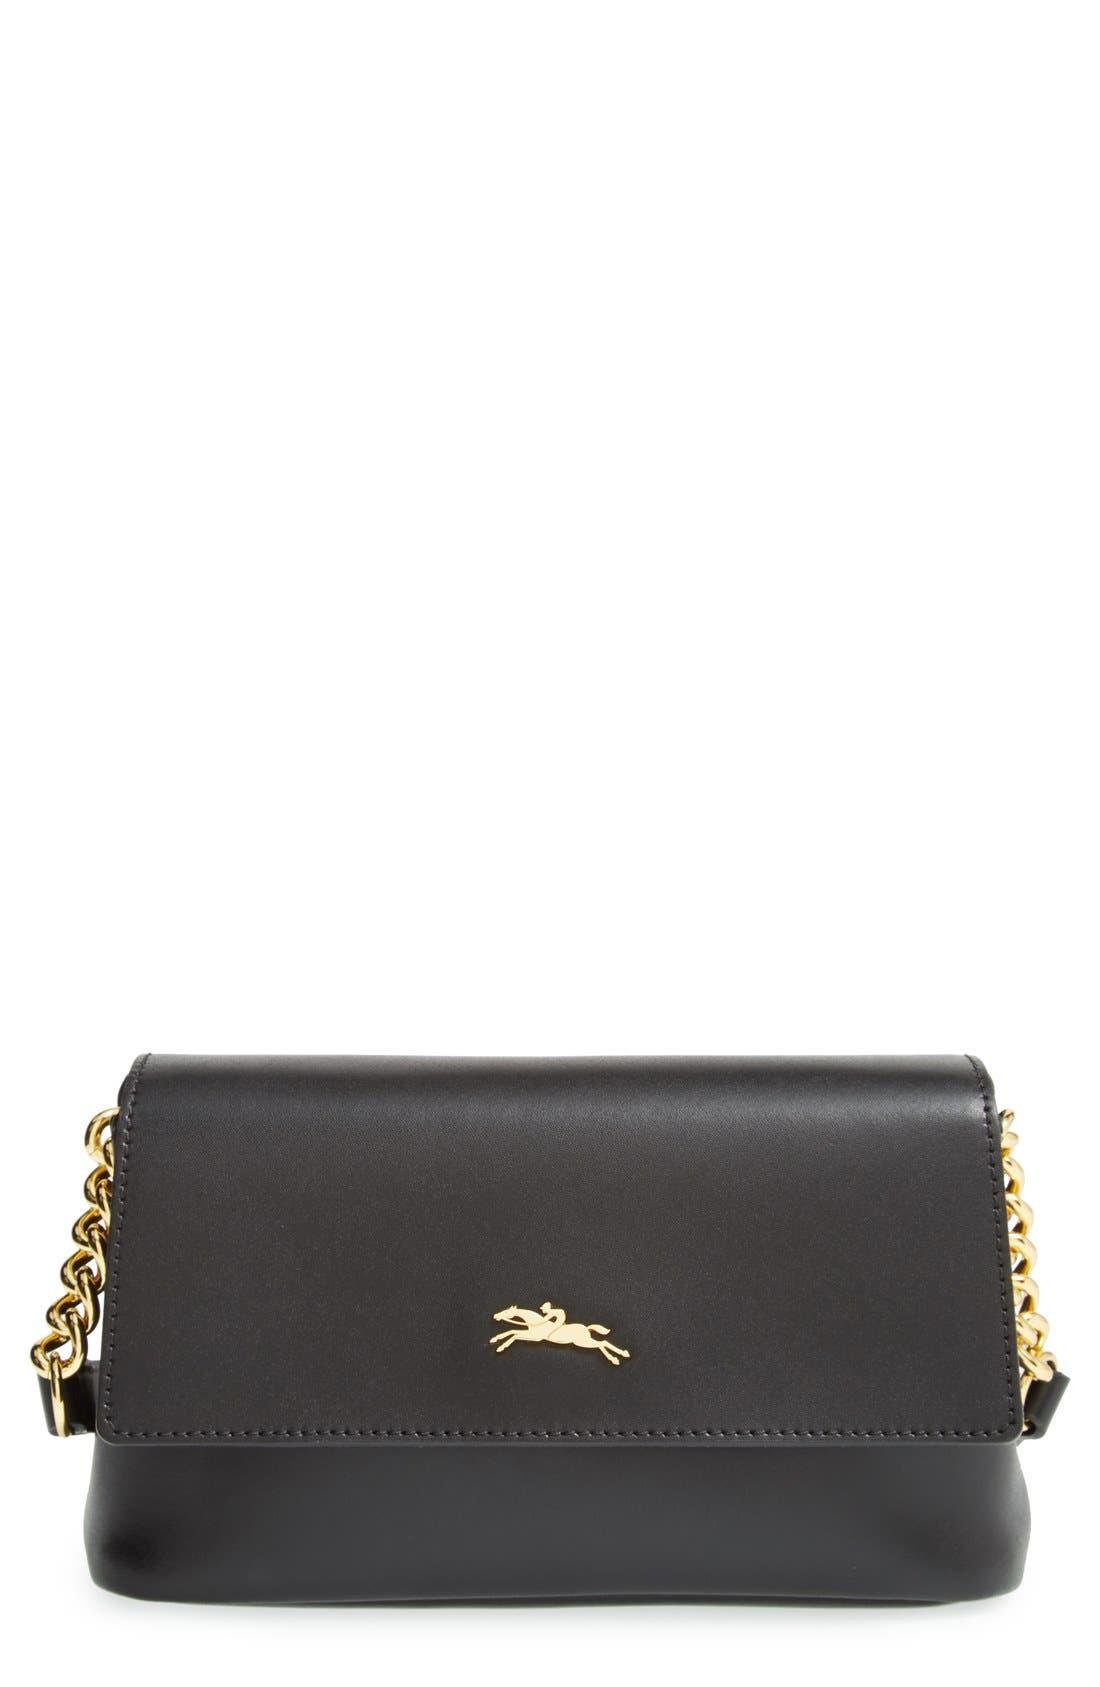 Main Image - Longchamp 'Honore' Crossbody Bag